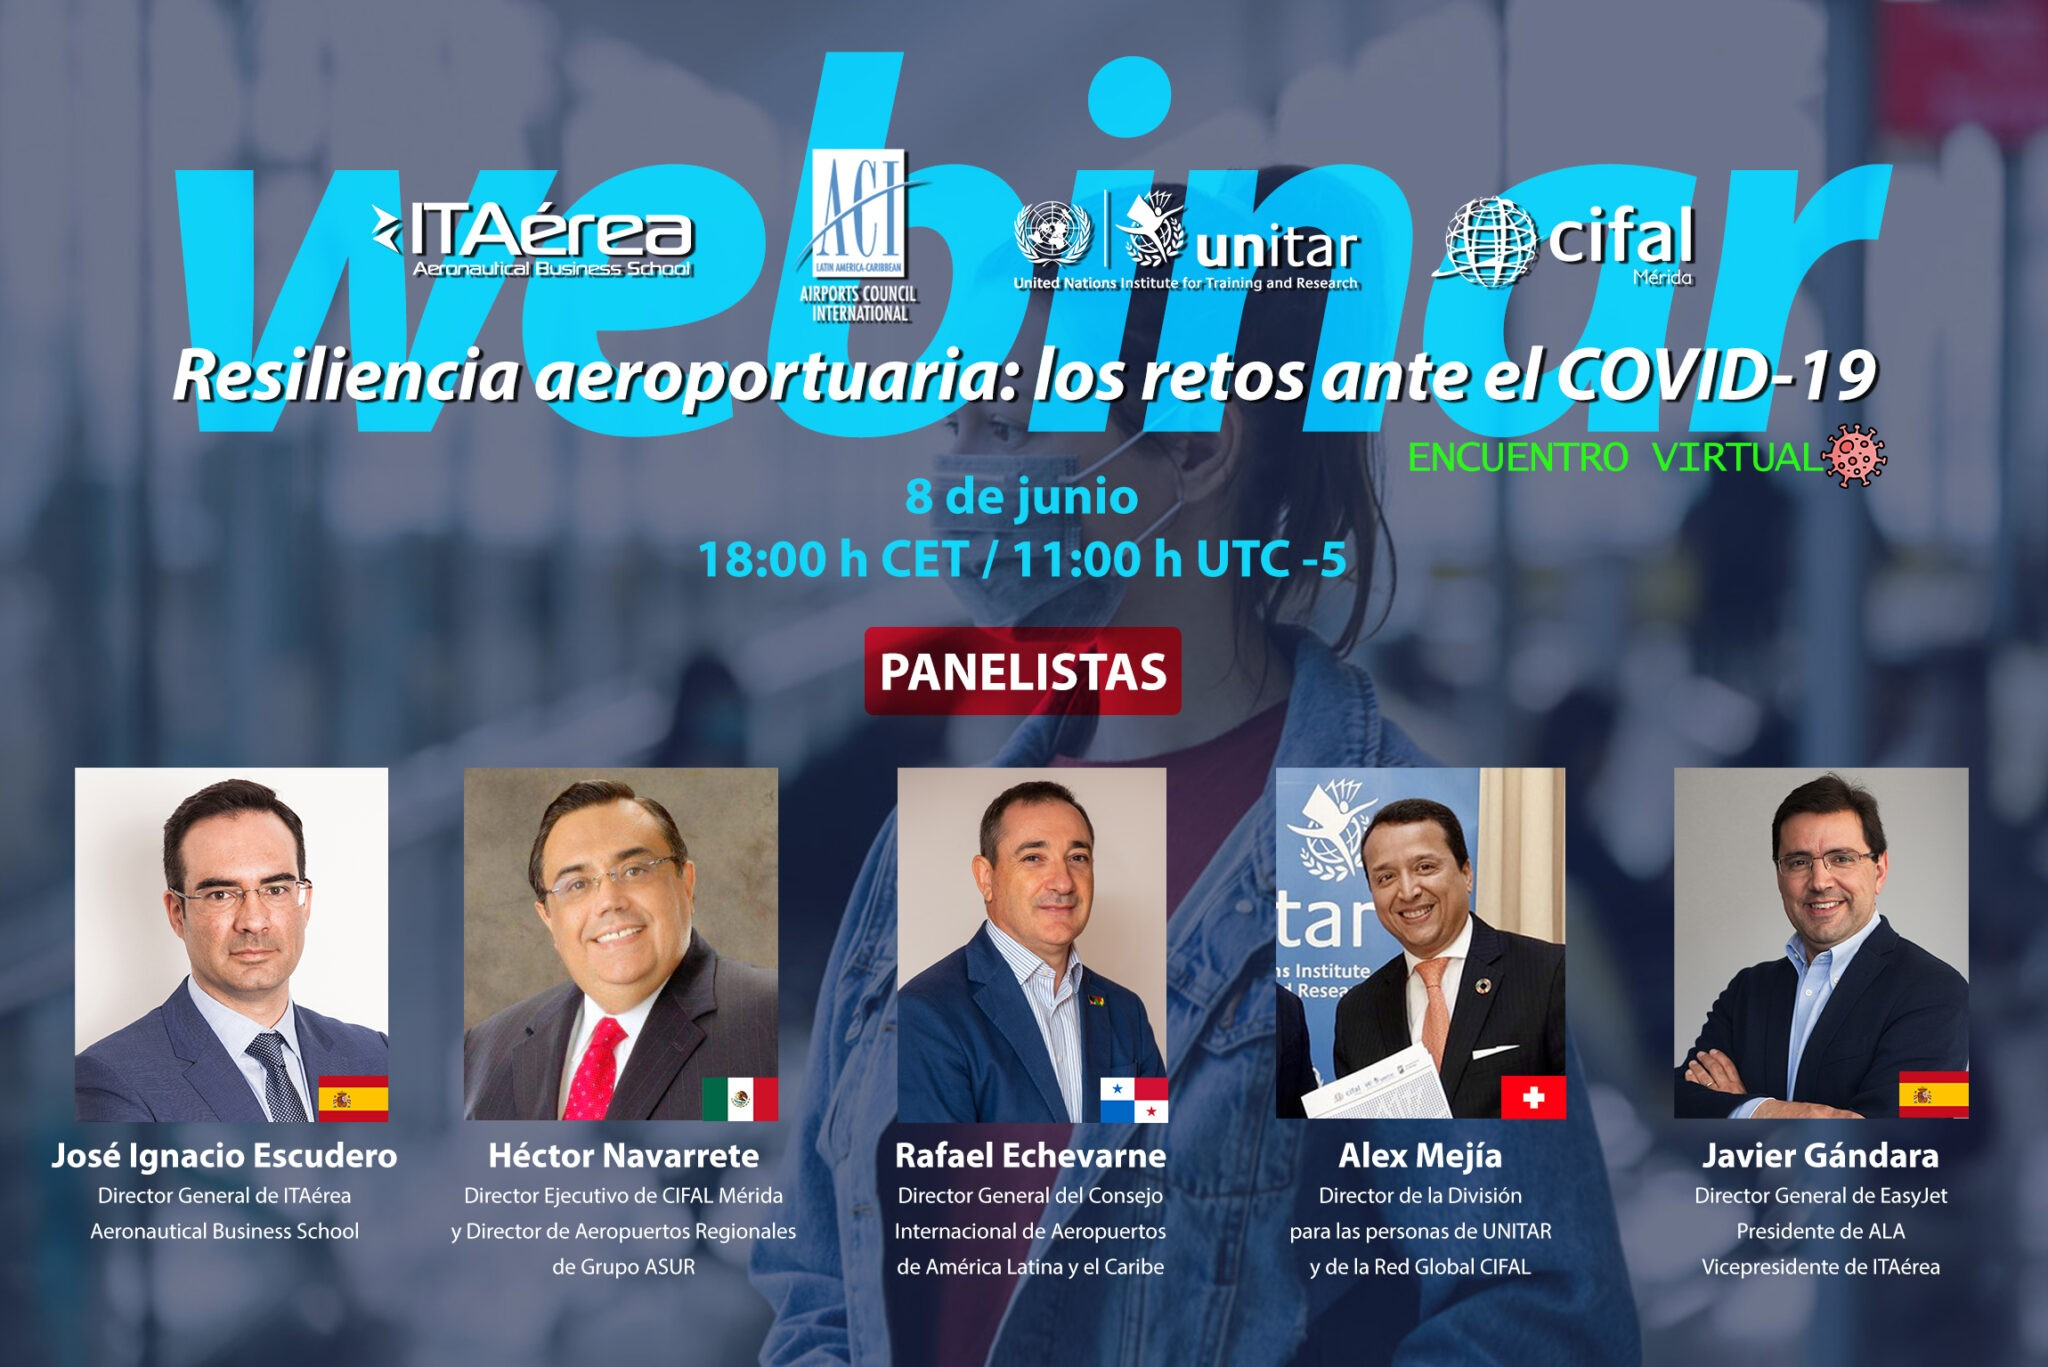 WEBINAR ACI LAC 8 junio 2 - V Sector Meeting: Airports